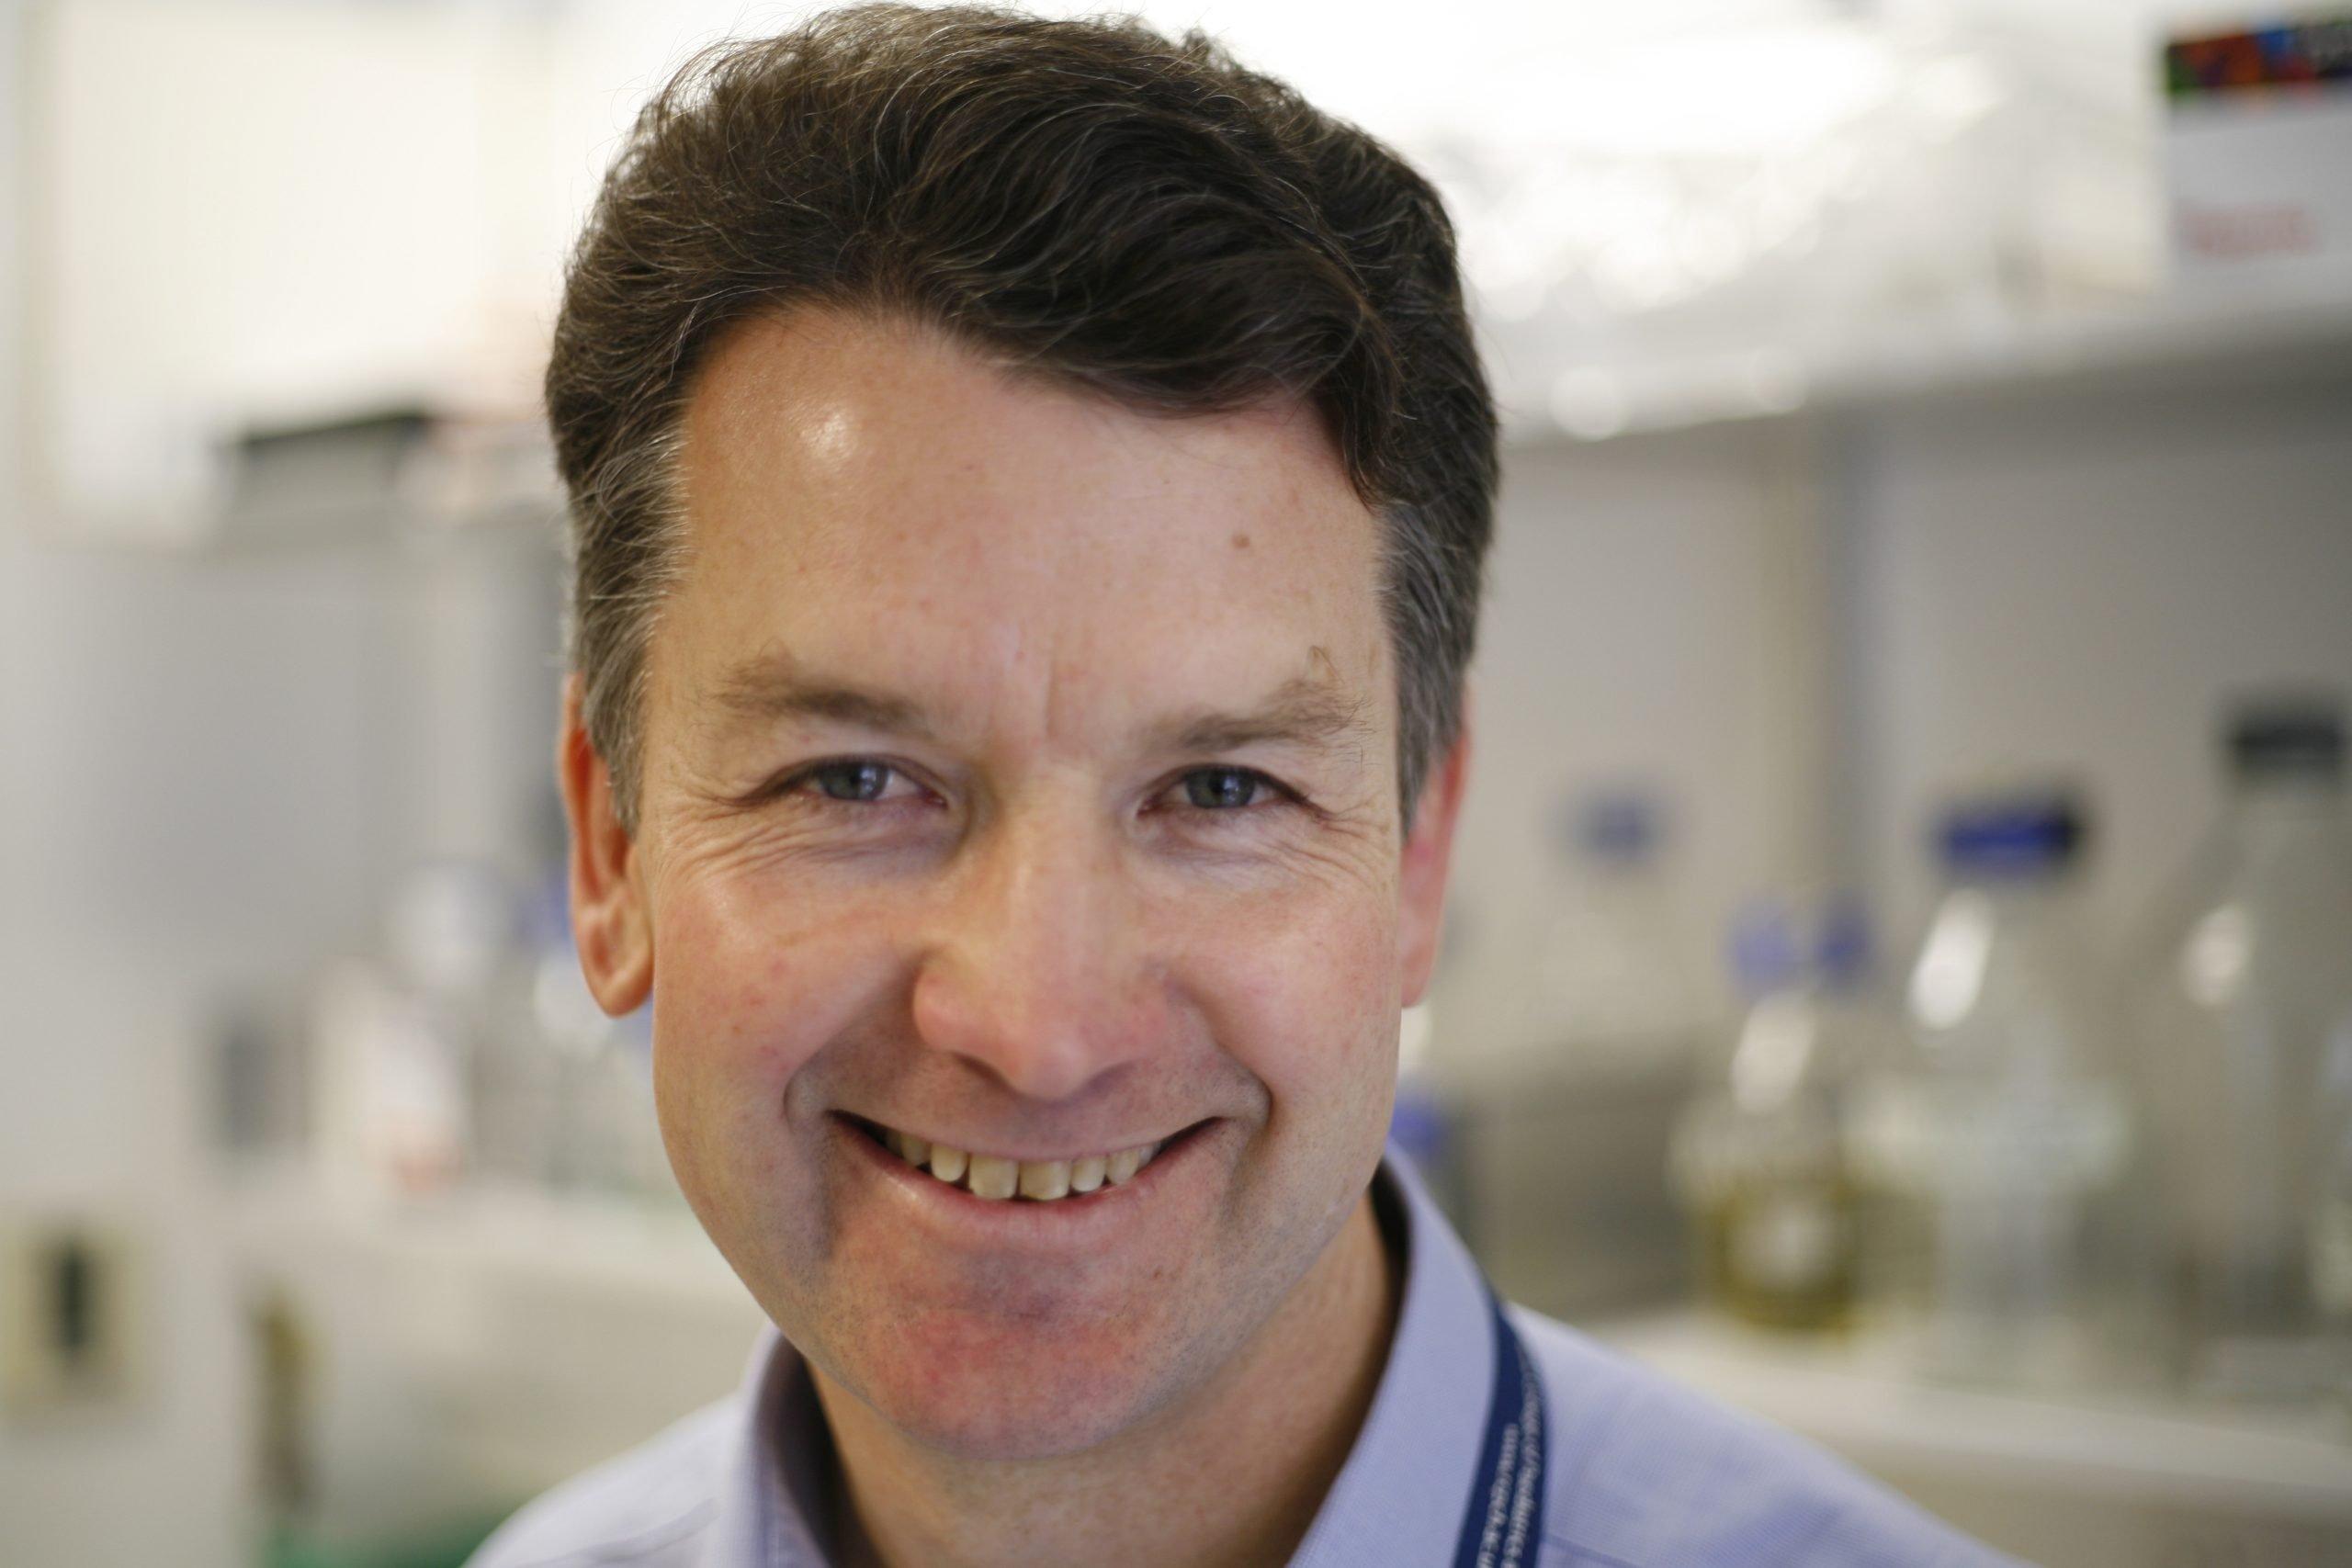 Paul Heath, Prof. of Paediatric Infectious Diseases, St George's University of London